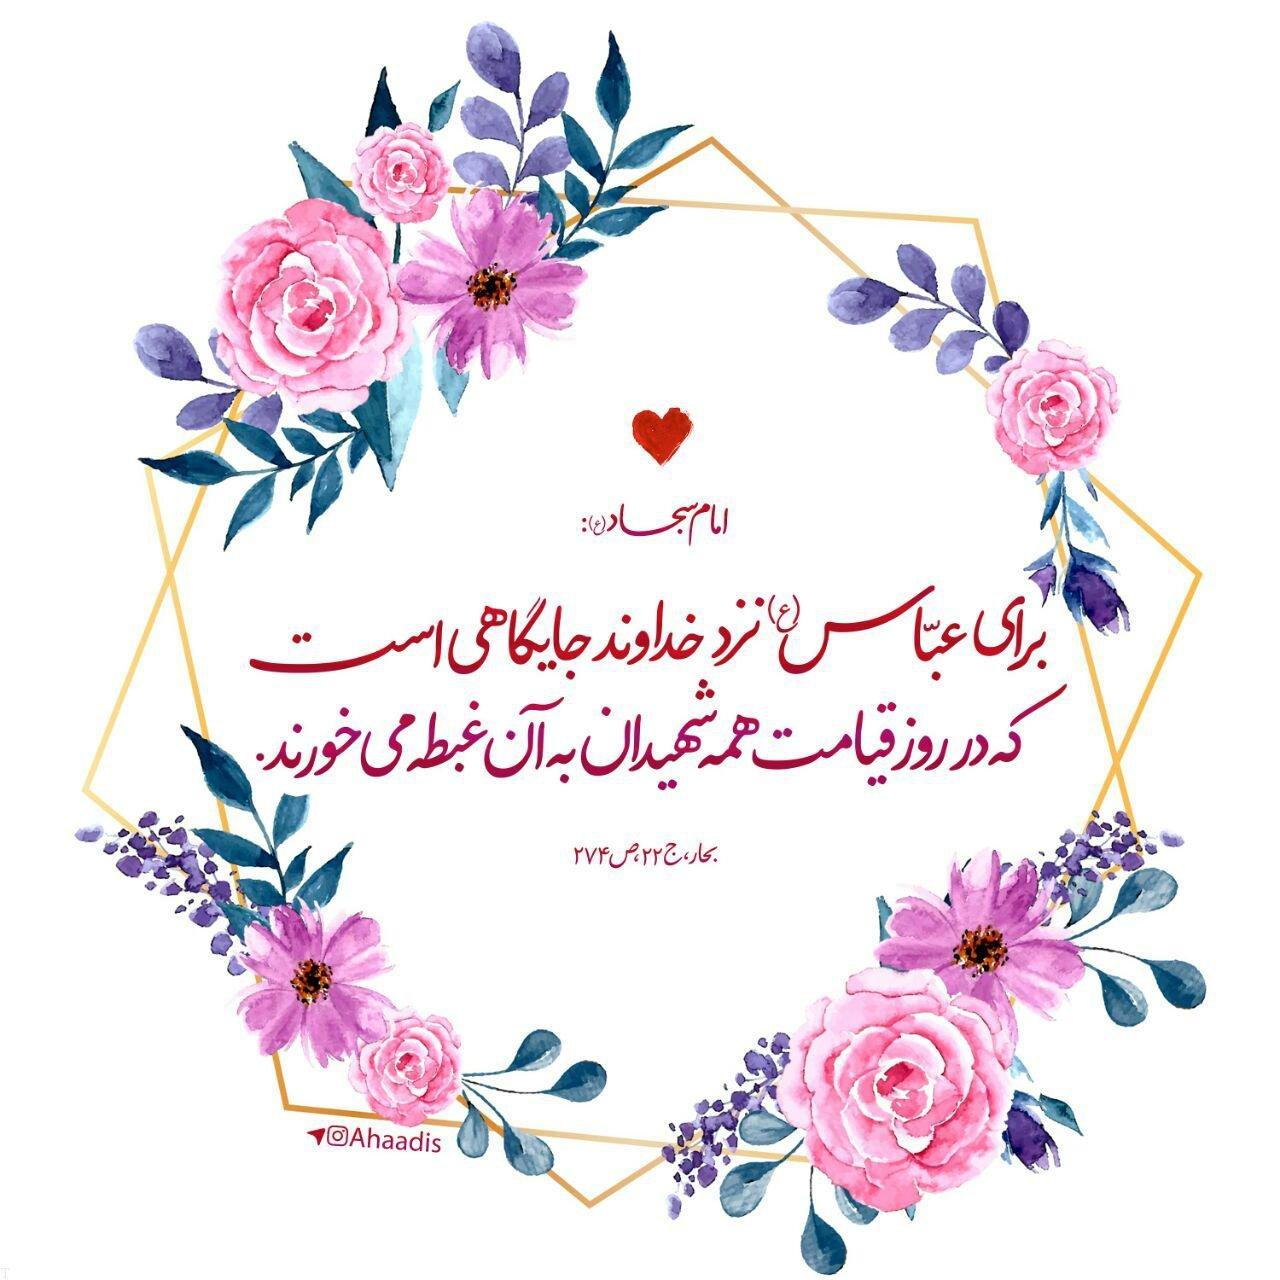 عکس پروفایل تبریک ولادت حضرت ابوالفضل عباس (ع) + متن تبریک ولادت حضرت عباس (ع)